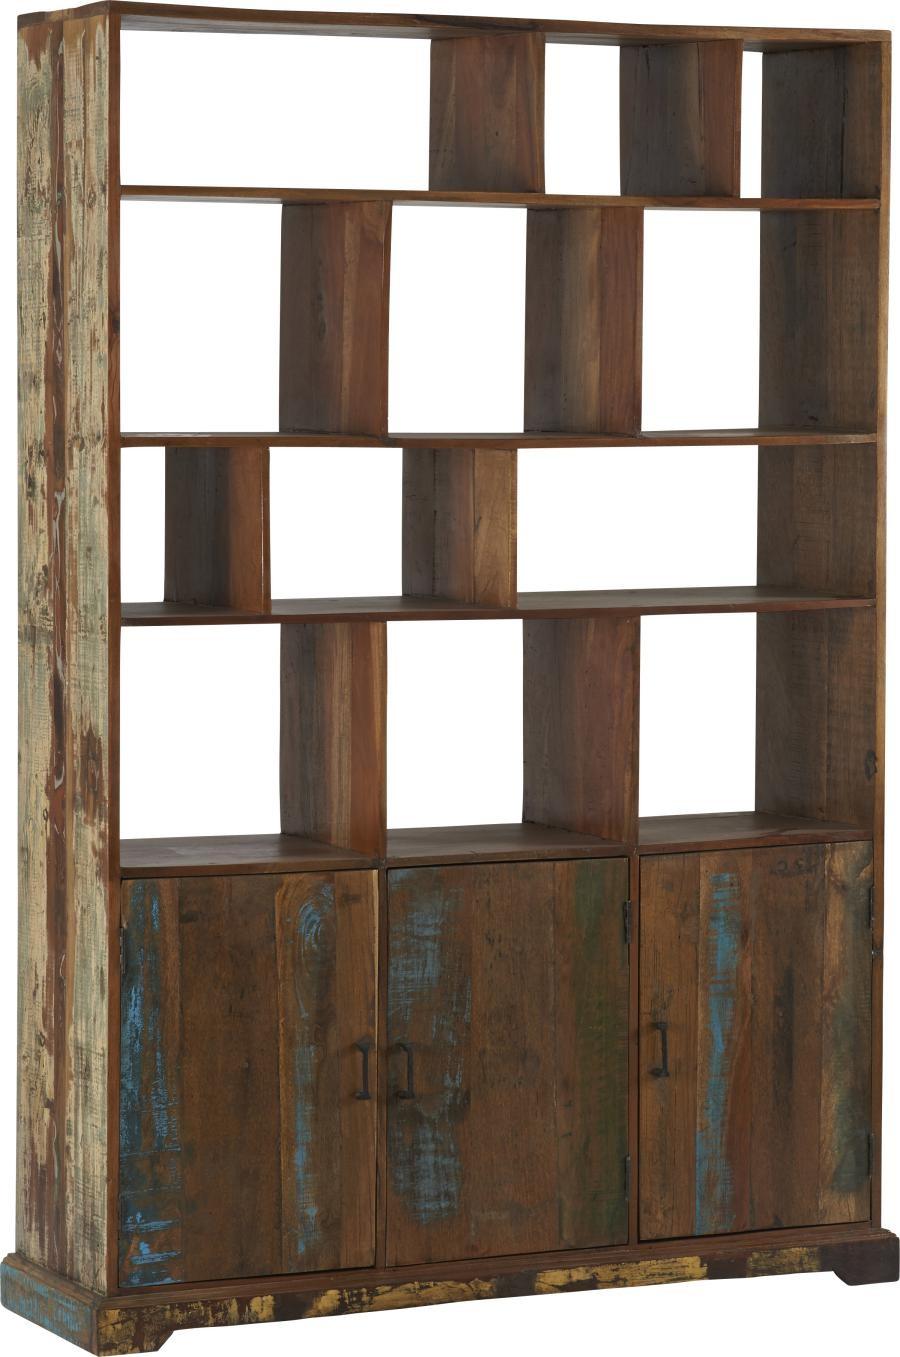 Biblioth Que En Bois Recycl Et Poign E Fer Forg 127x38xh183cm Han  # Bibliotheque Fer Forge